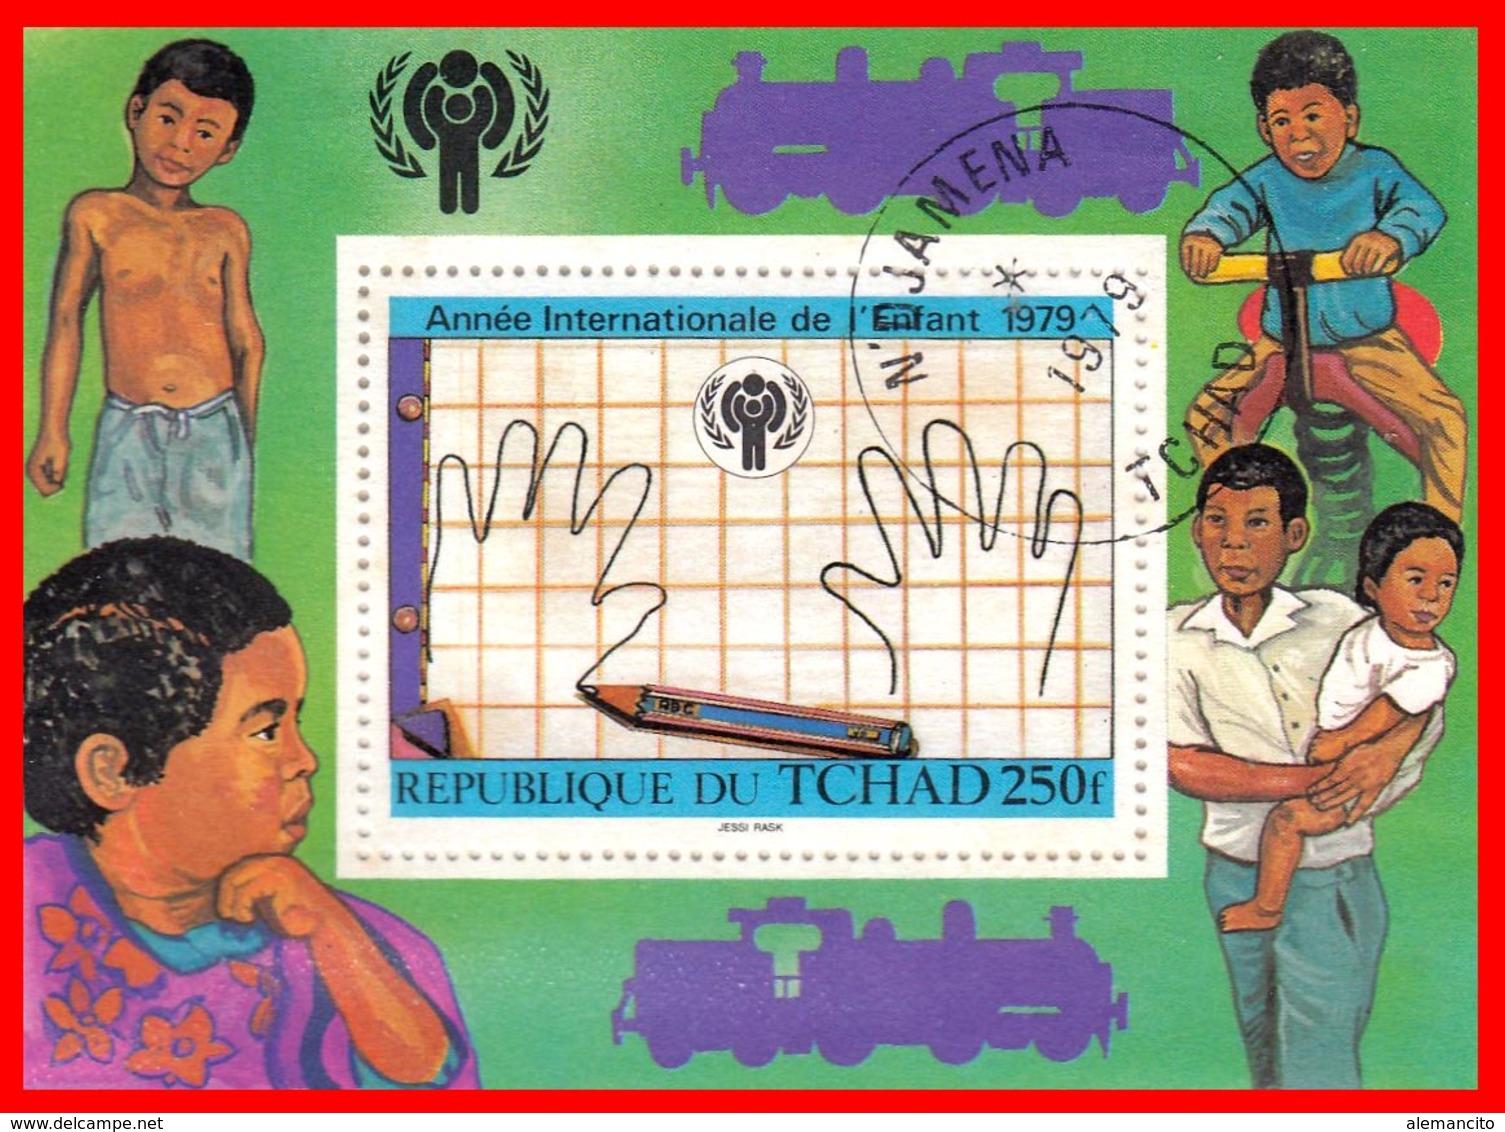 REPUBLICA DU TCHAD HOJITA AÑO INTERNACIONAL DEL NIÑO 1979 - Repubblica Centroafricana